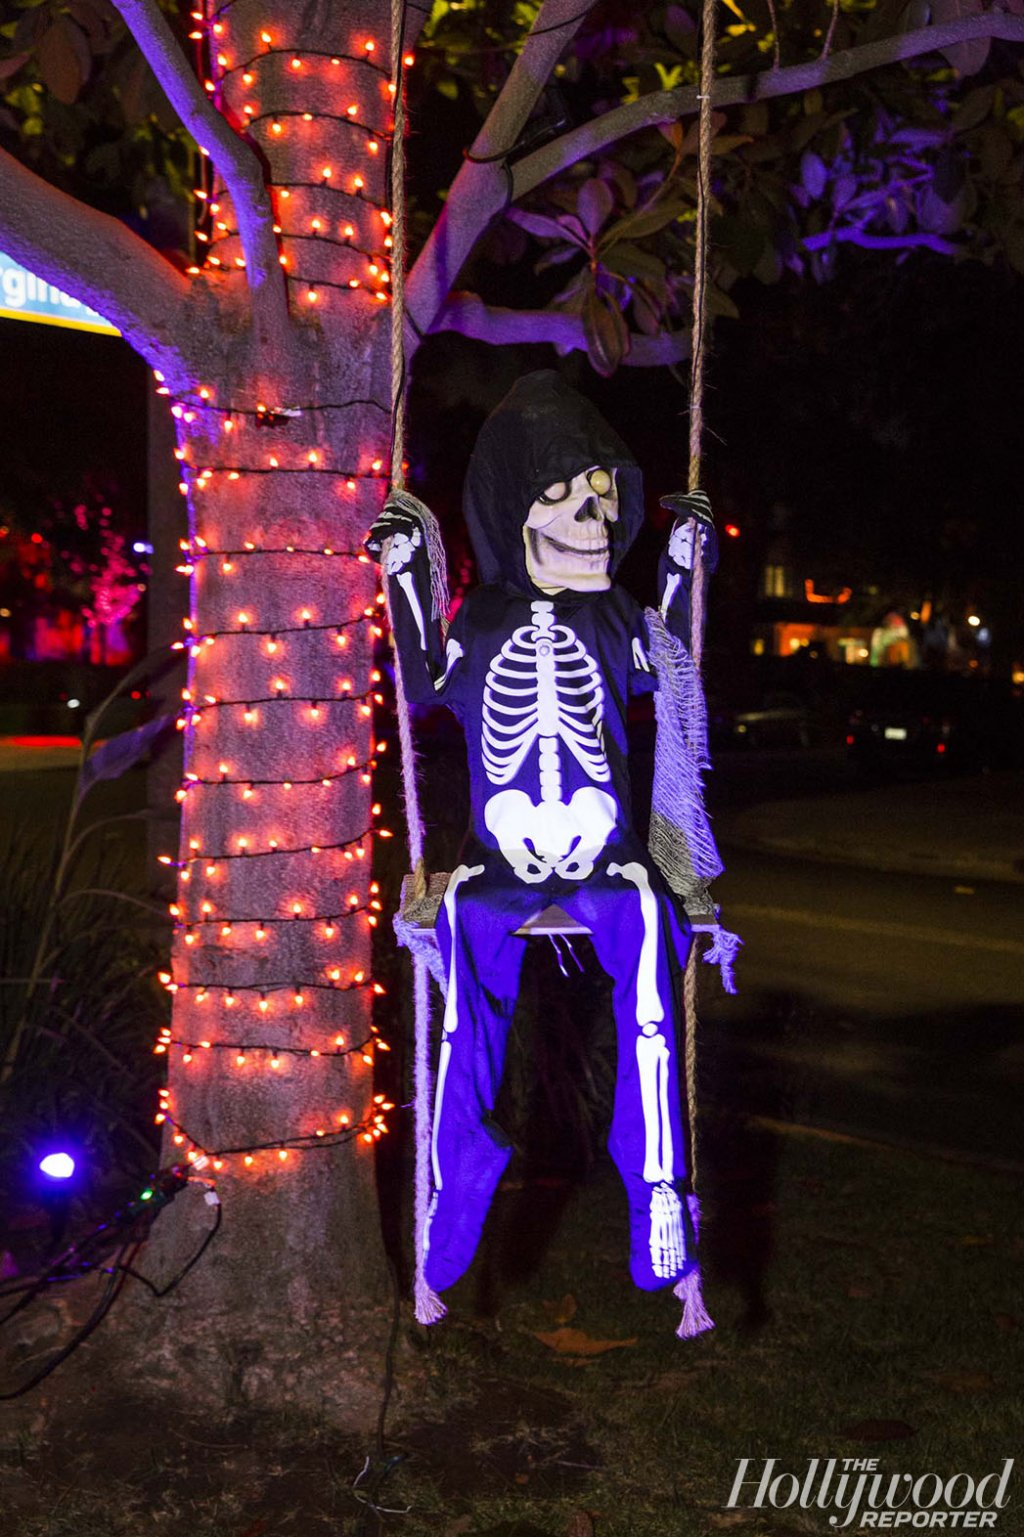 Halloween halloween Halloween Decoration in L.A. Homes THR HalloweenHouses 101616THR HalloweenHouses131